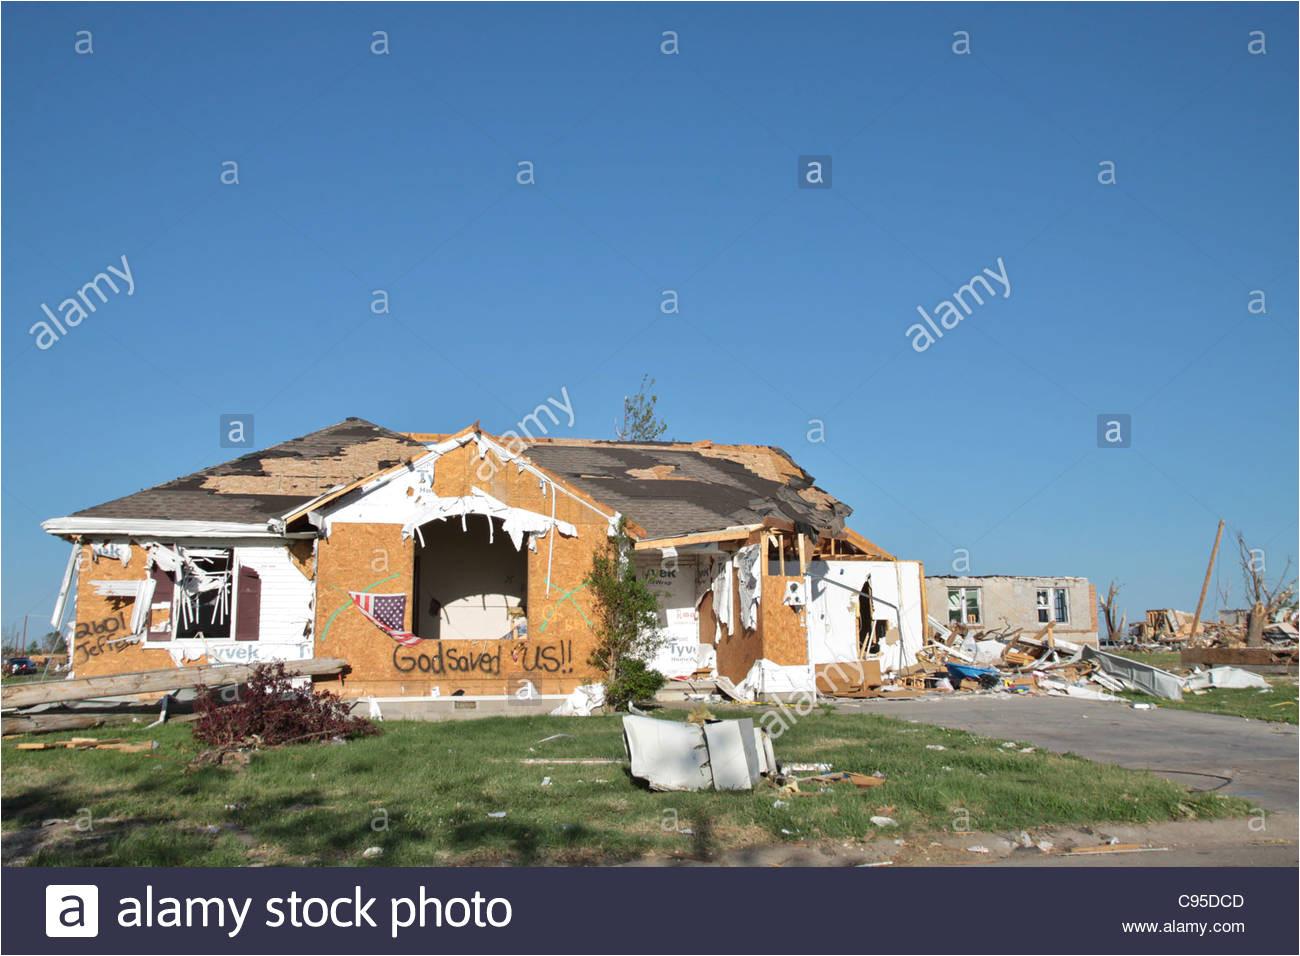 a house damaged by the tornado in joplin missouri in 2011 stock image